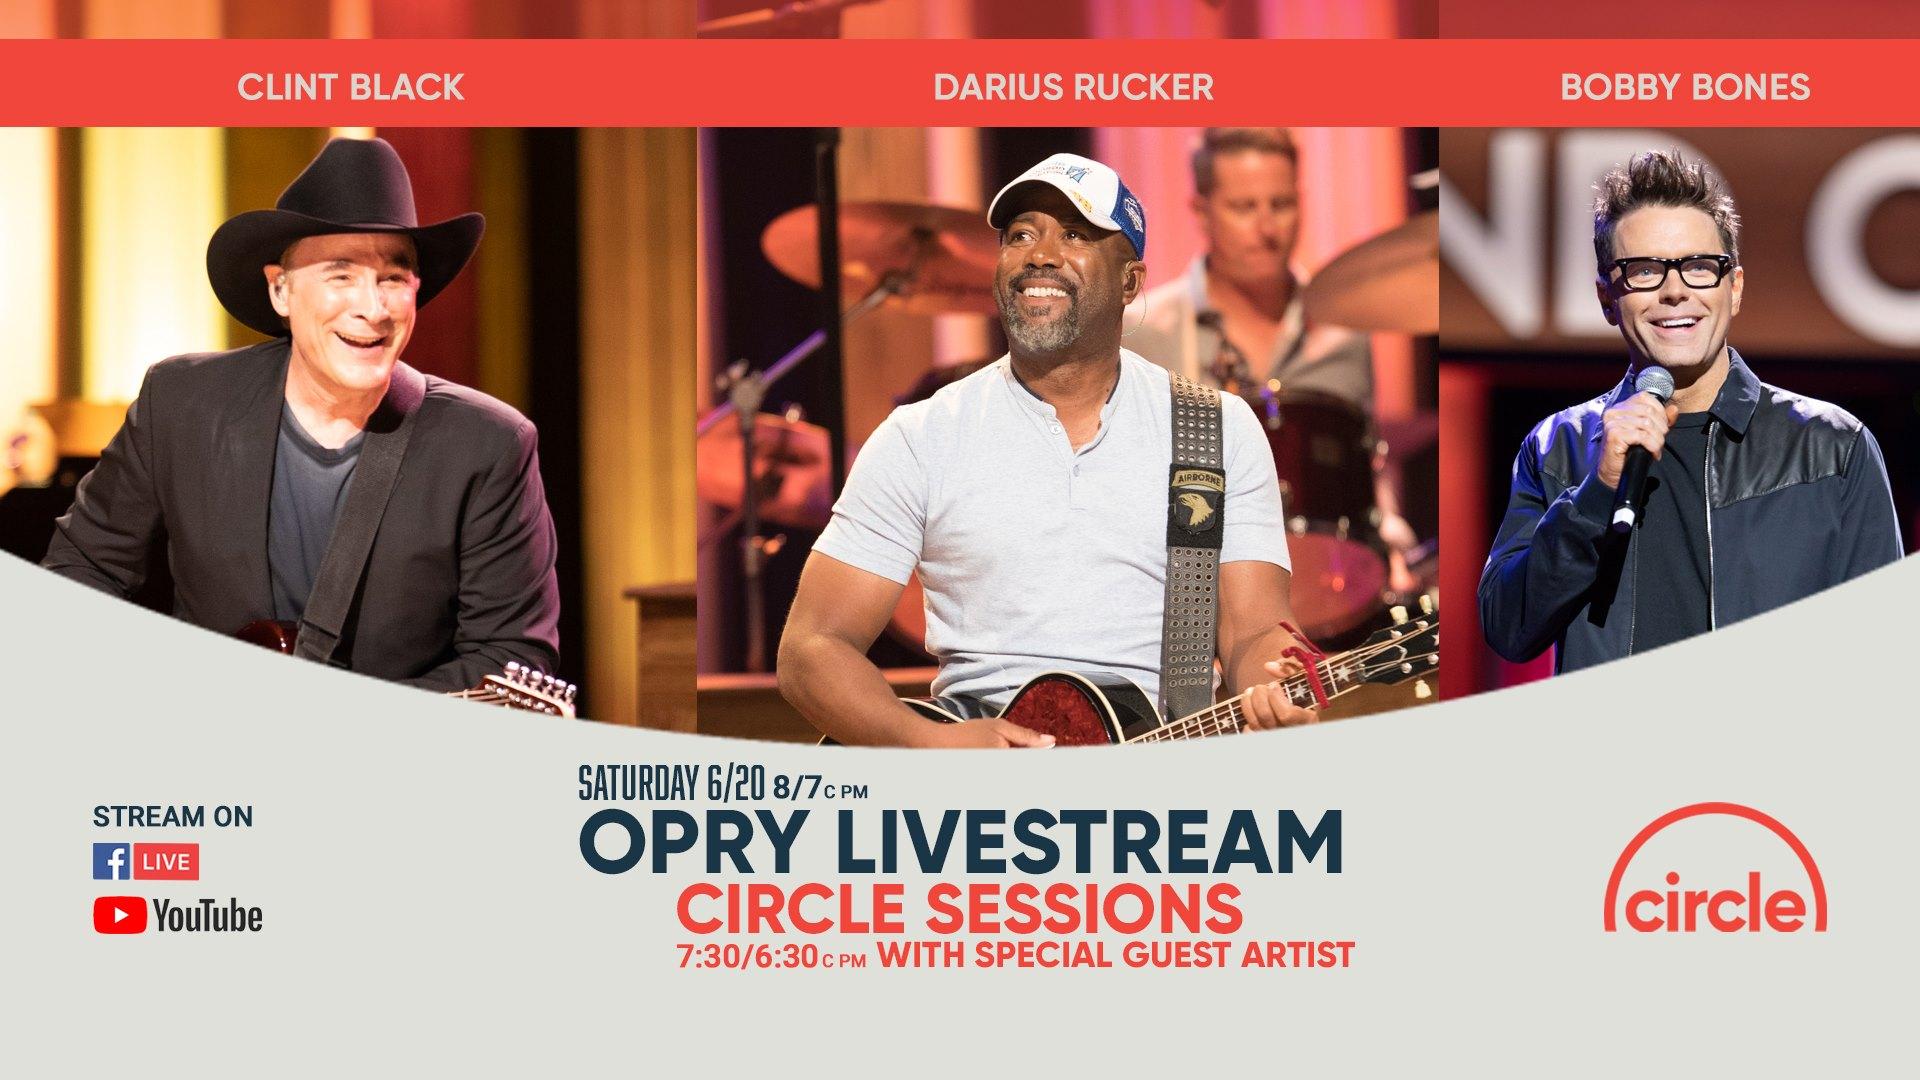 Darius Joins Clint Black & Bobby Bones on Opry Livestream